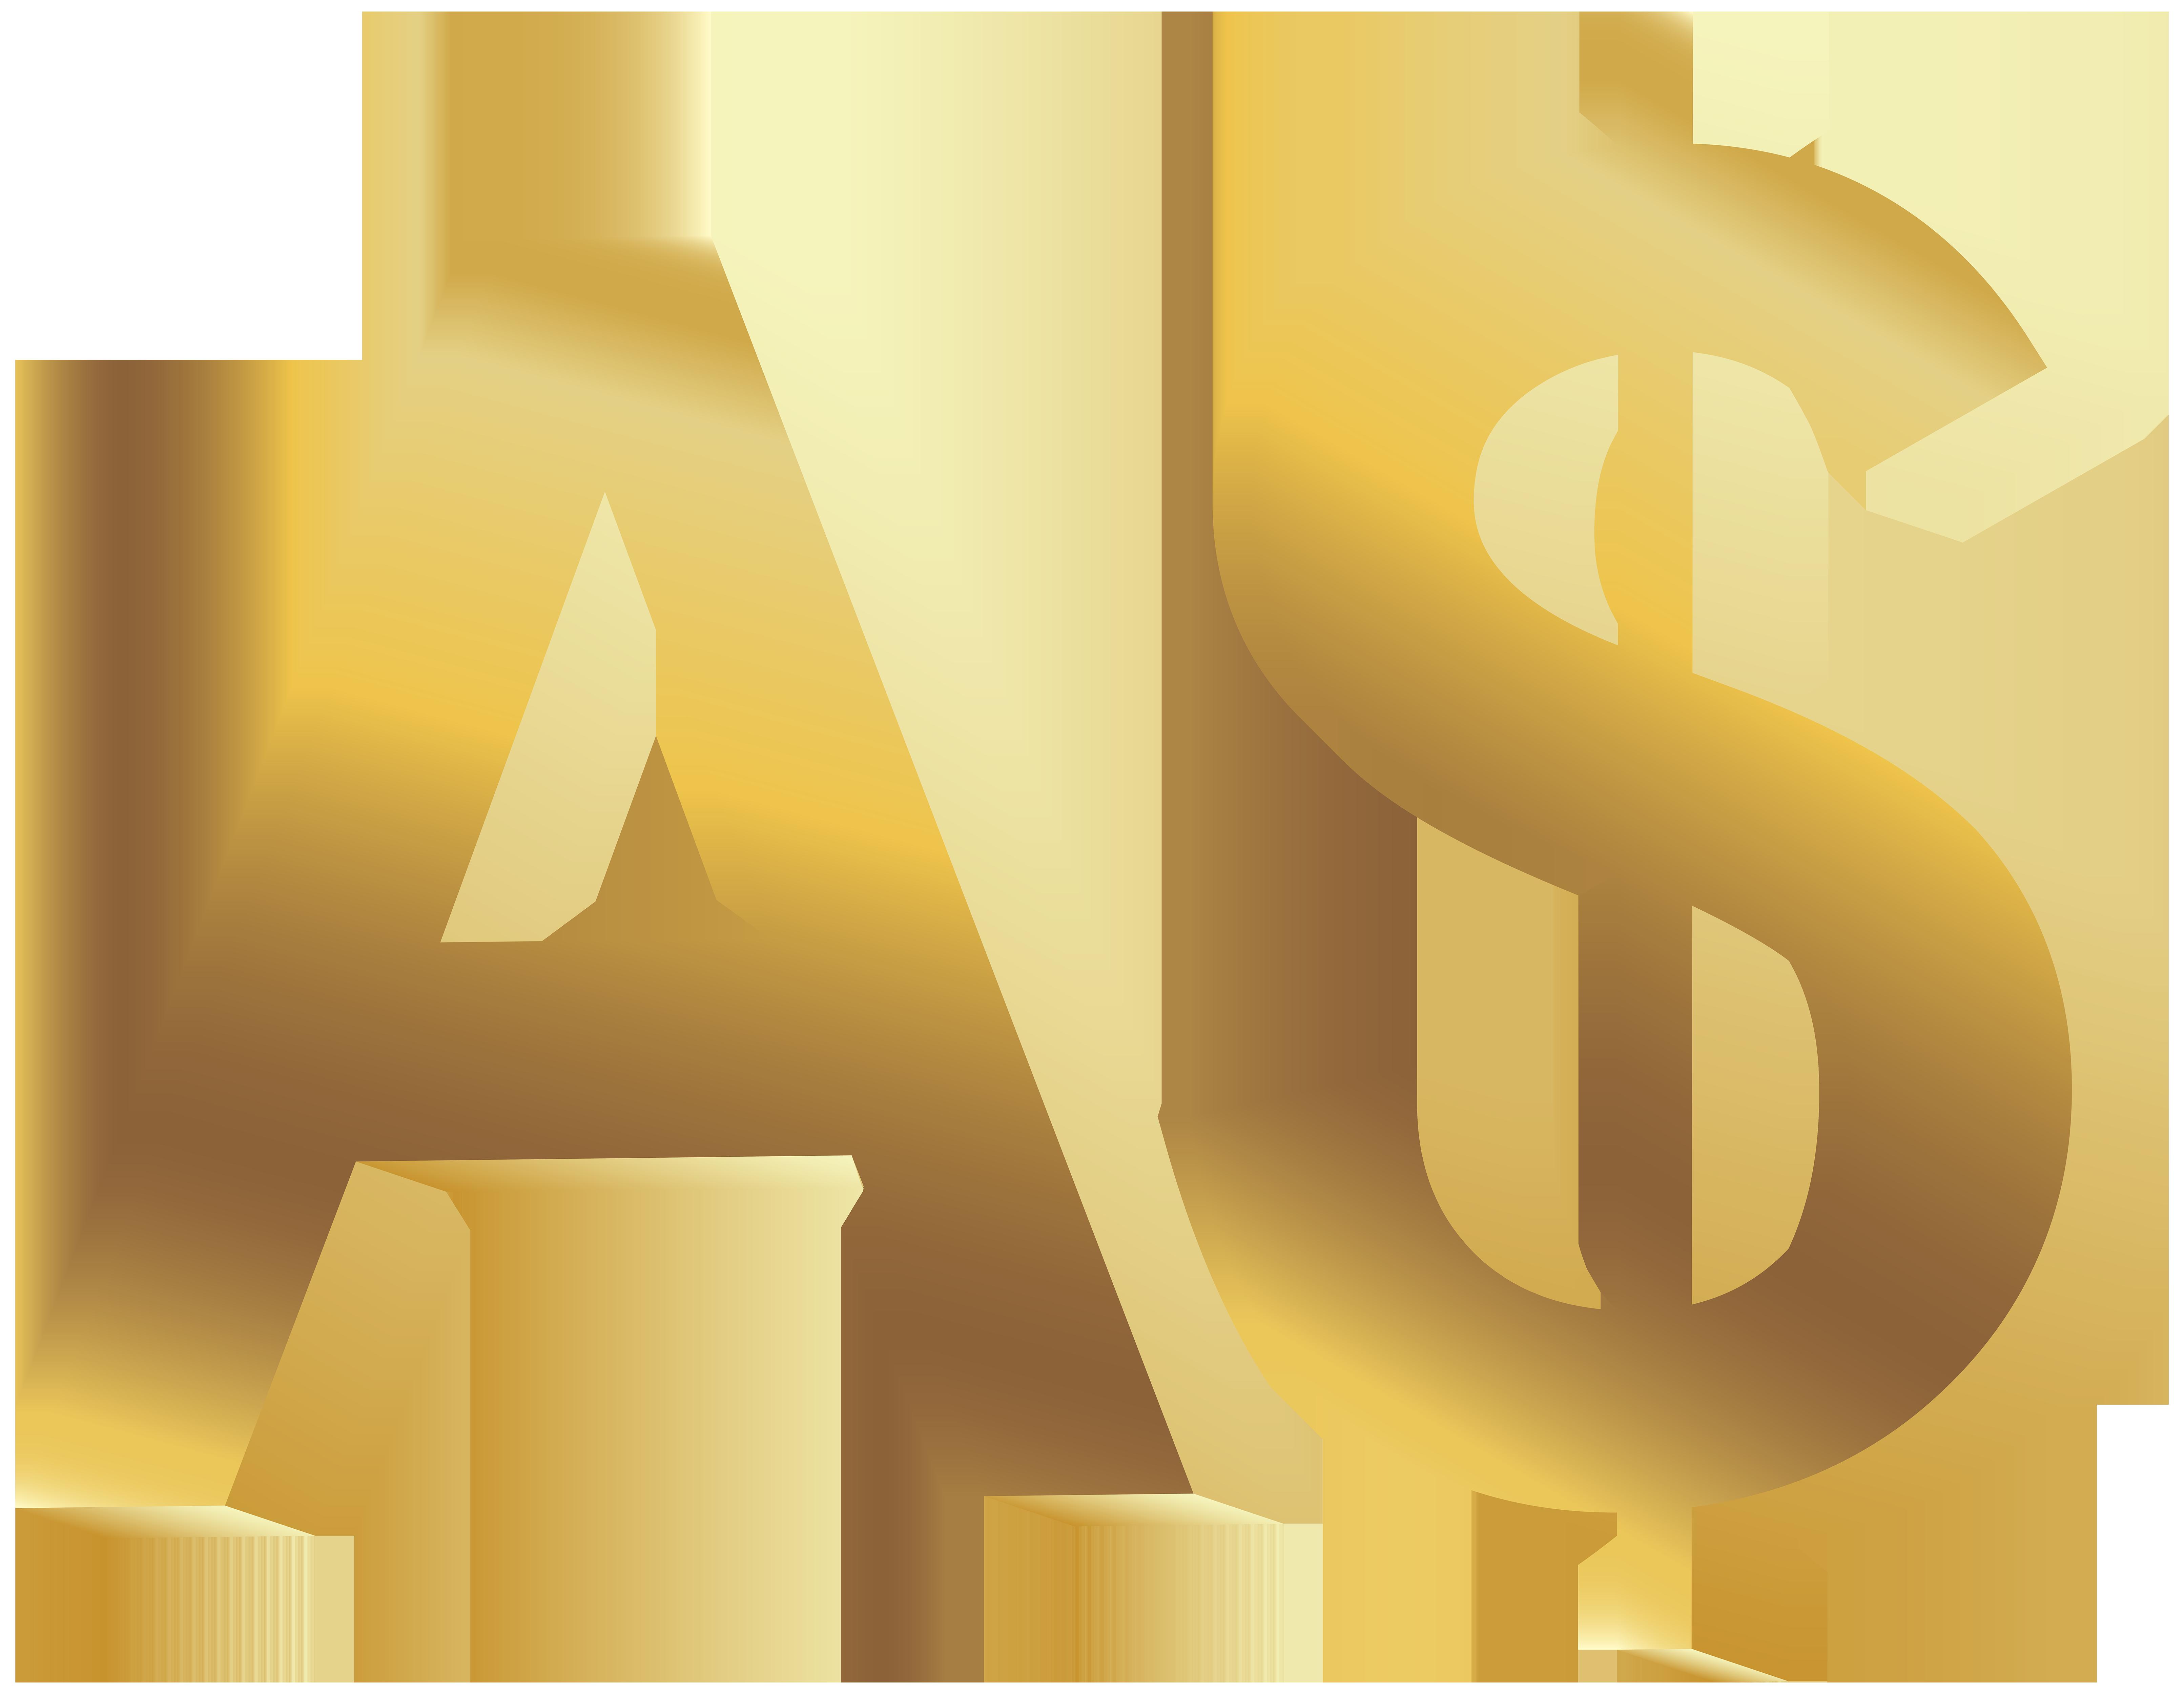 Coin clipart money australian. Dollar symbol png clip